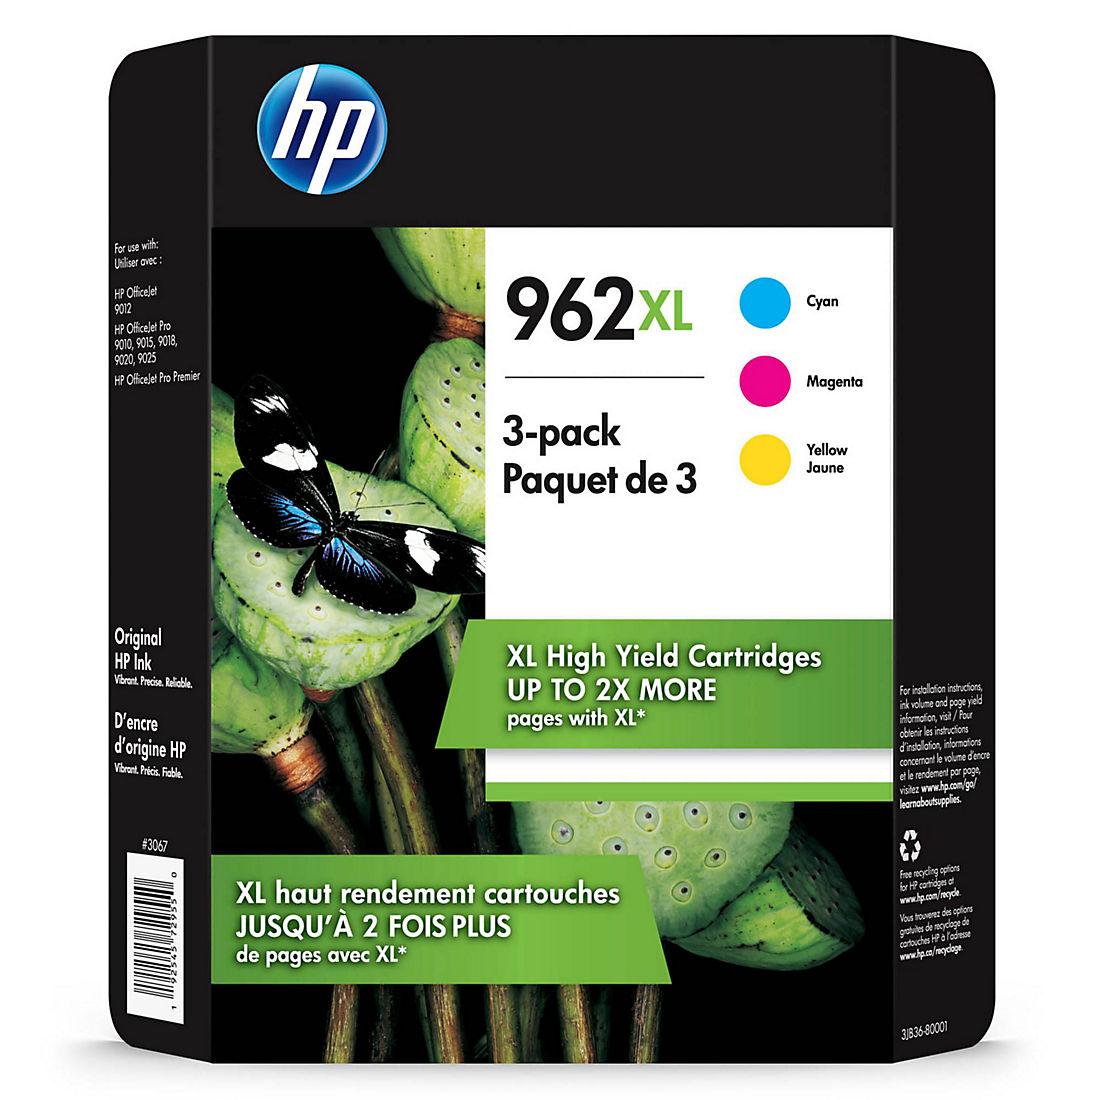 Cyan, Magenta, Yellow HP 951 Color Ink Cartridges 3-Pack in Retail Box !!!